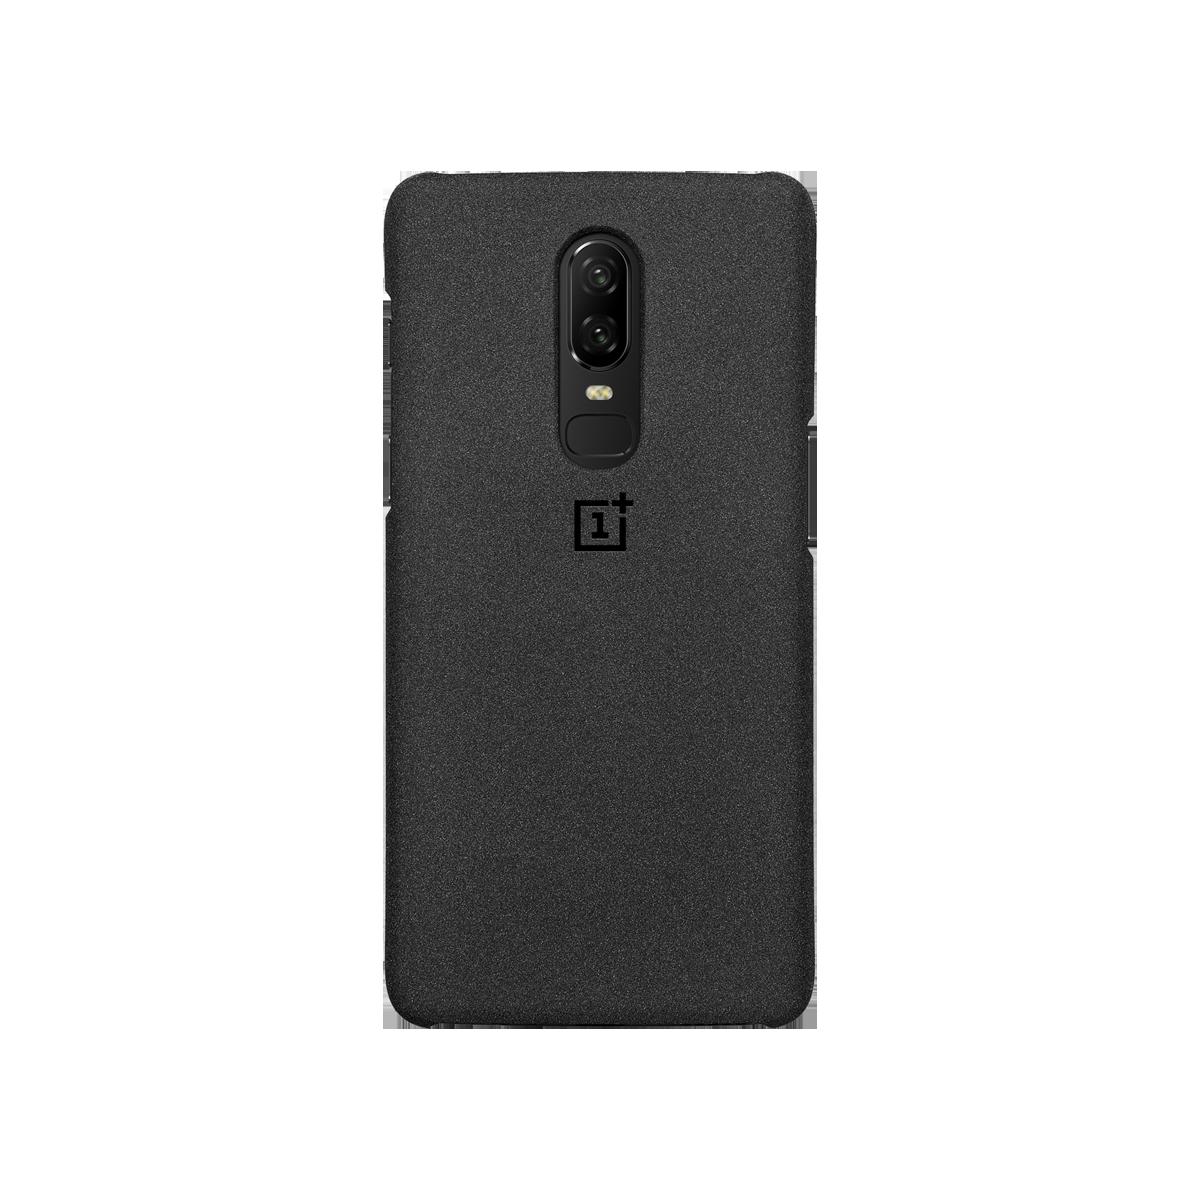 OnePlus 6 Protective Case - OnePlus (India)